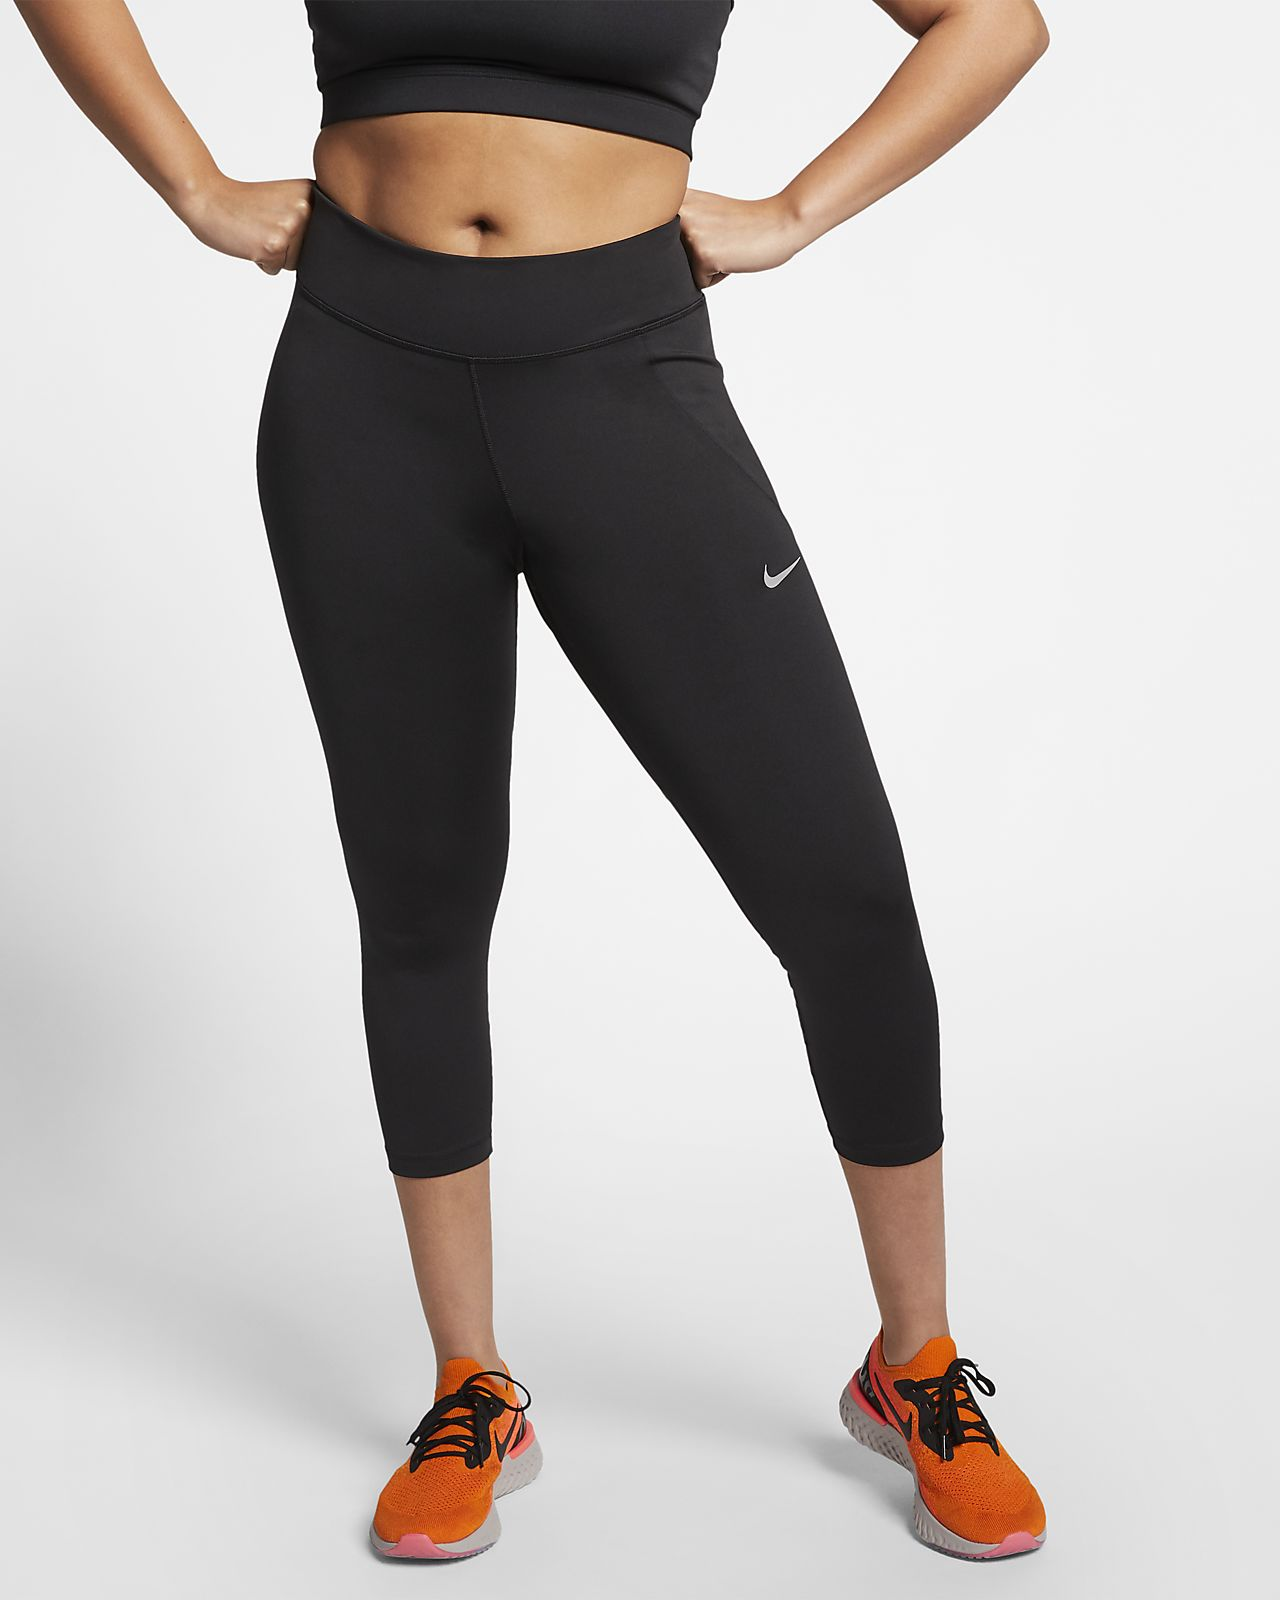 Nike Fast Women's 3/4 Running Crops (Plus Size)